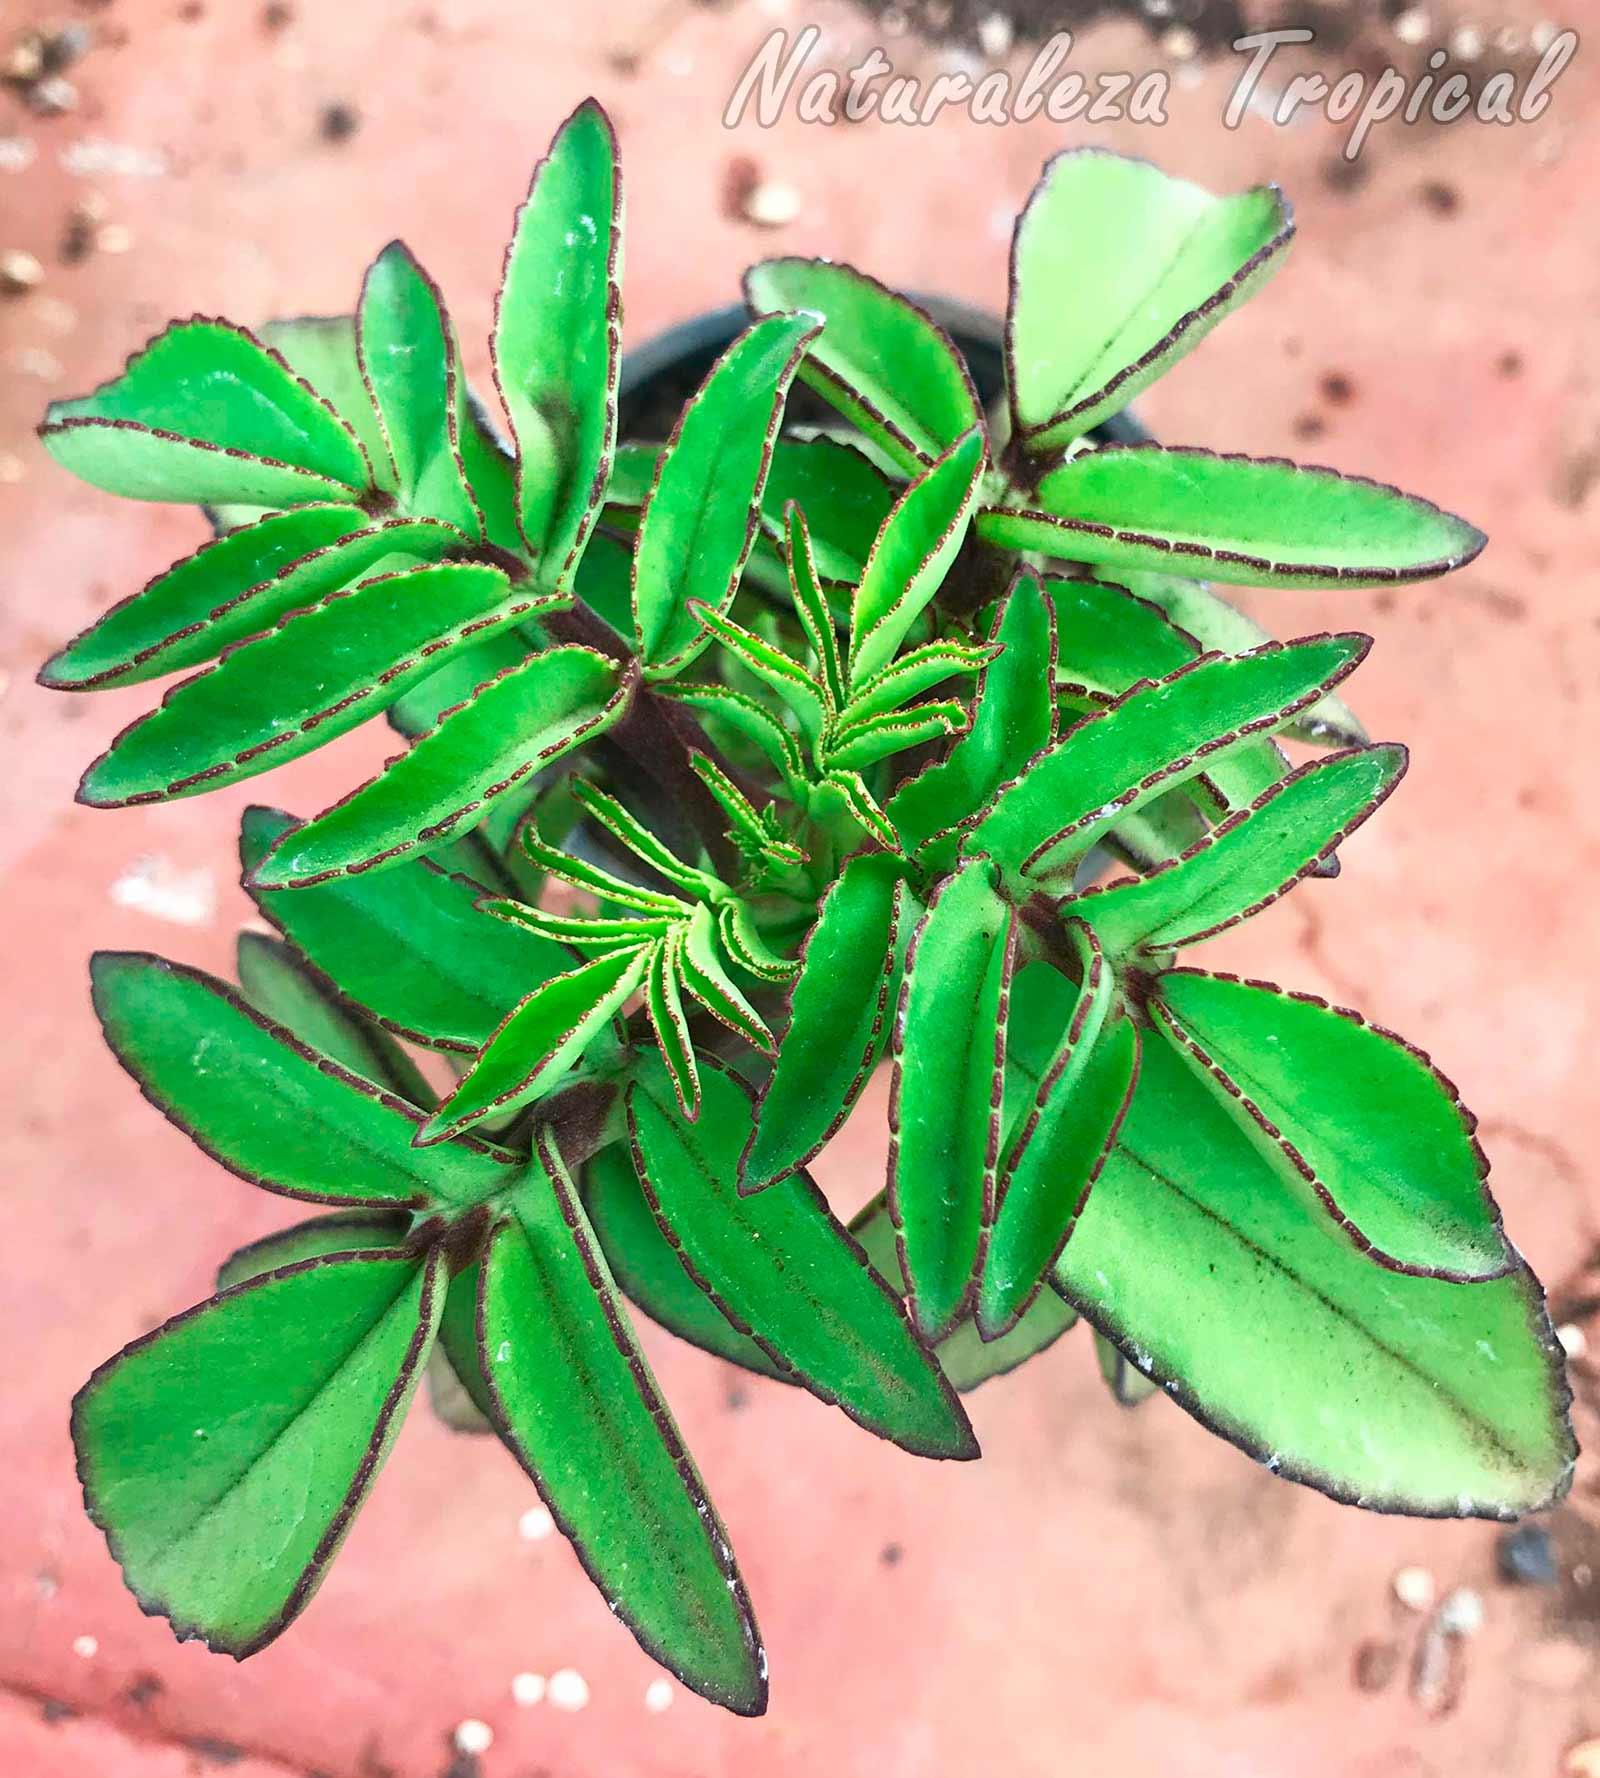 Vista de la planta suculenta Kalanchoe prolifera